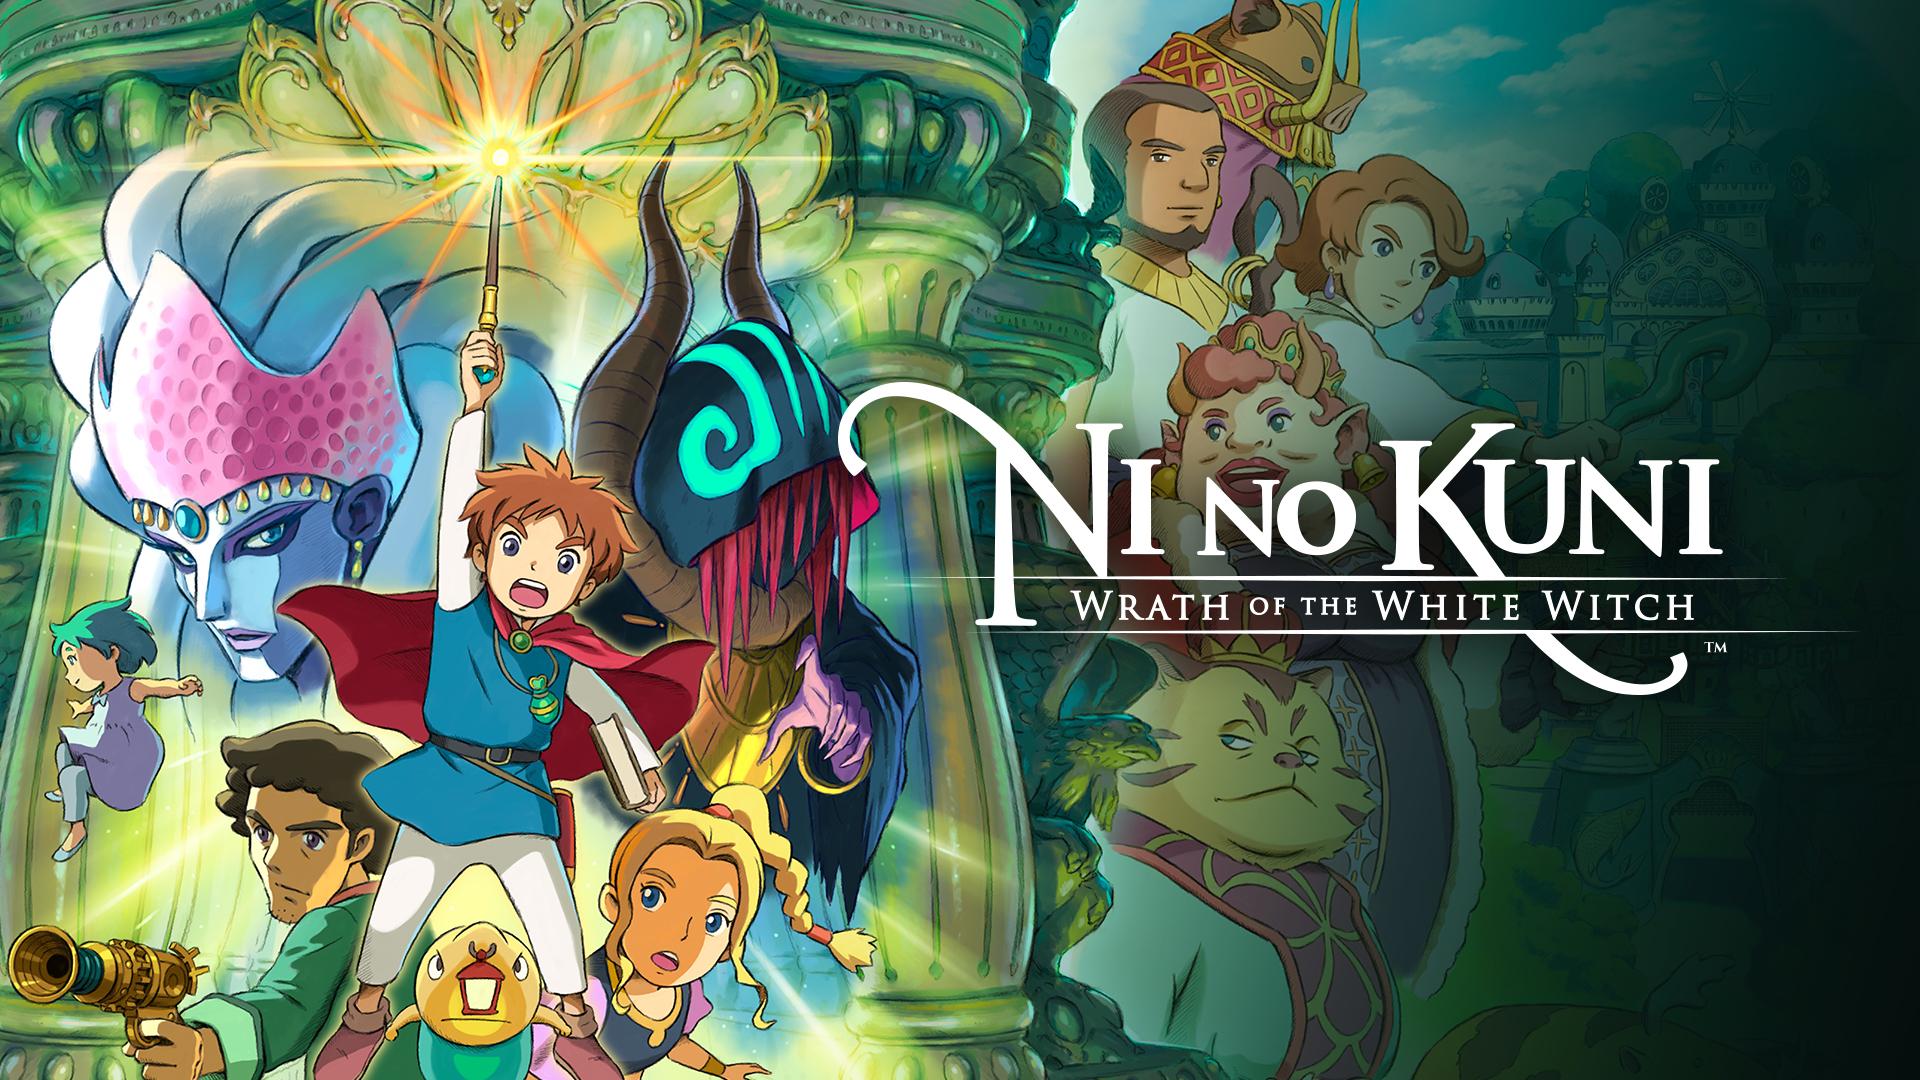 Ni no Kuni: La ira de la bruja blanca, Nintendo Switch (Eshop EEUU)